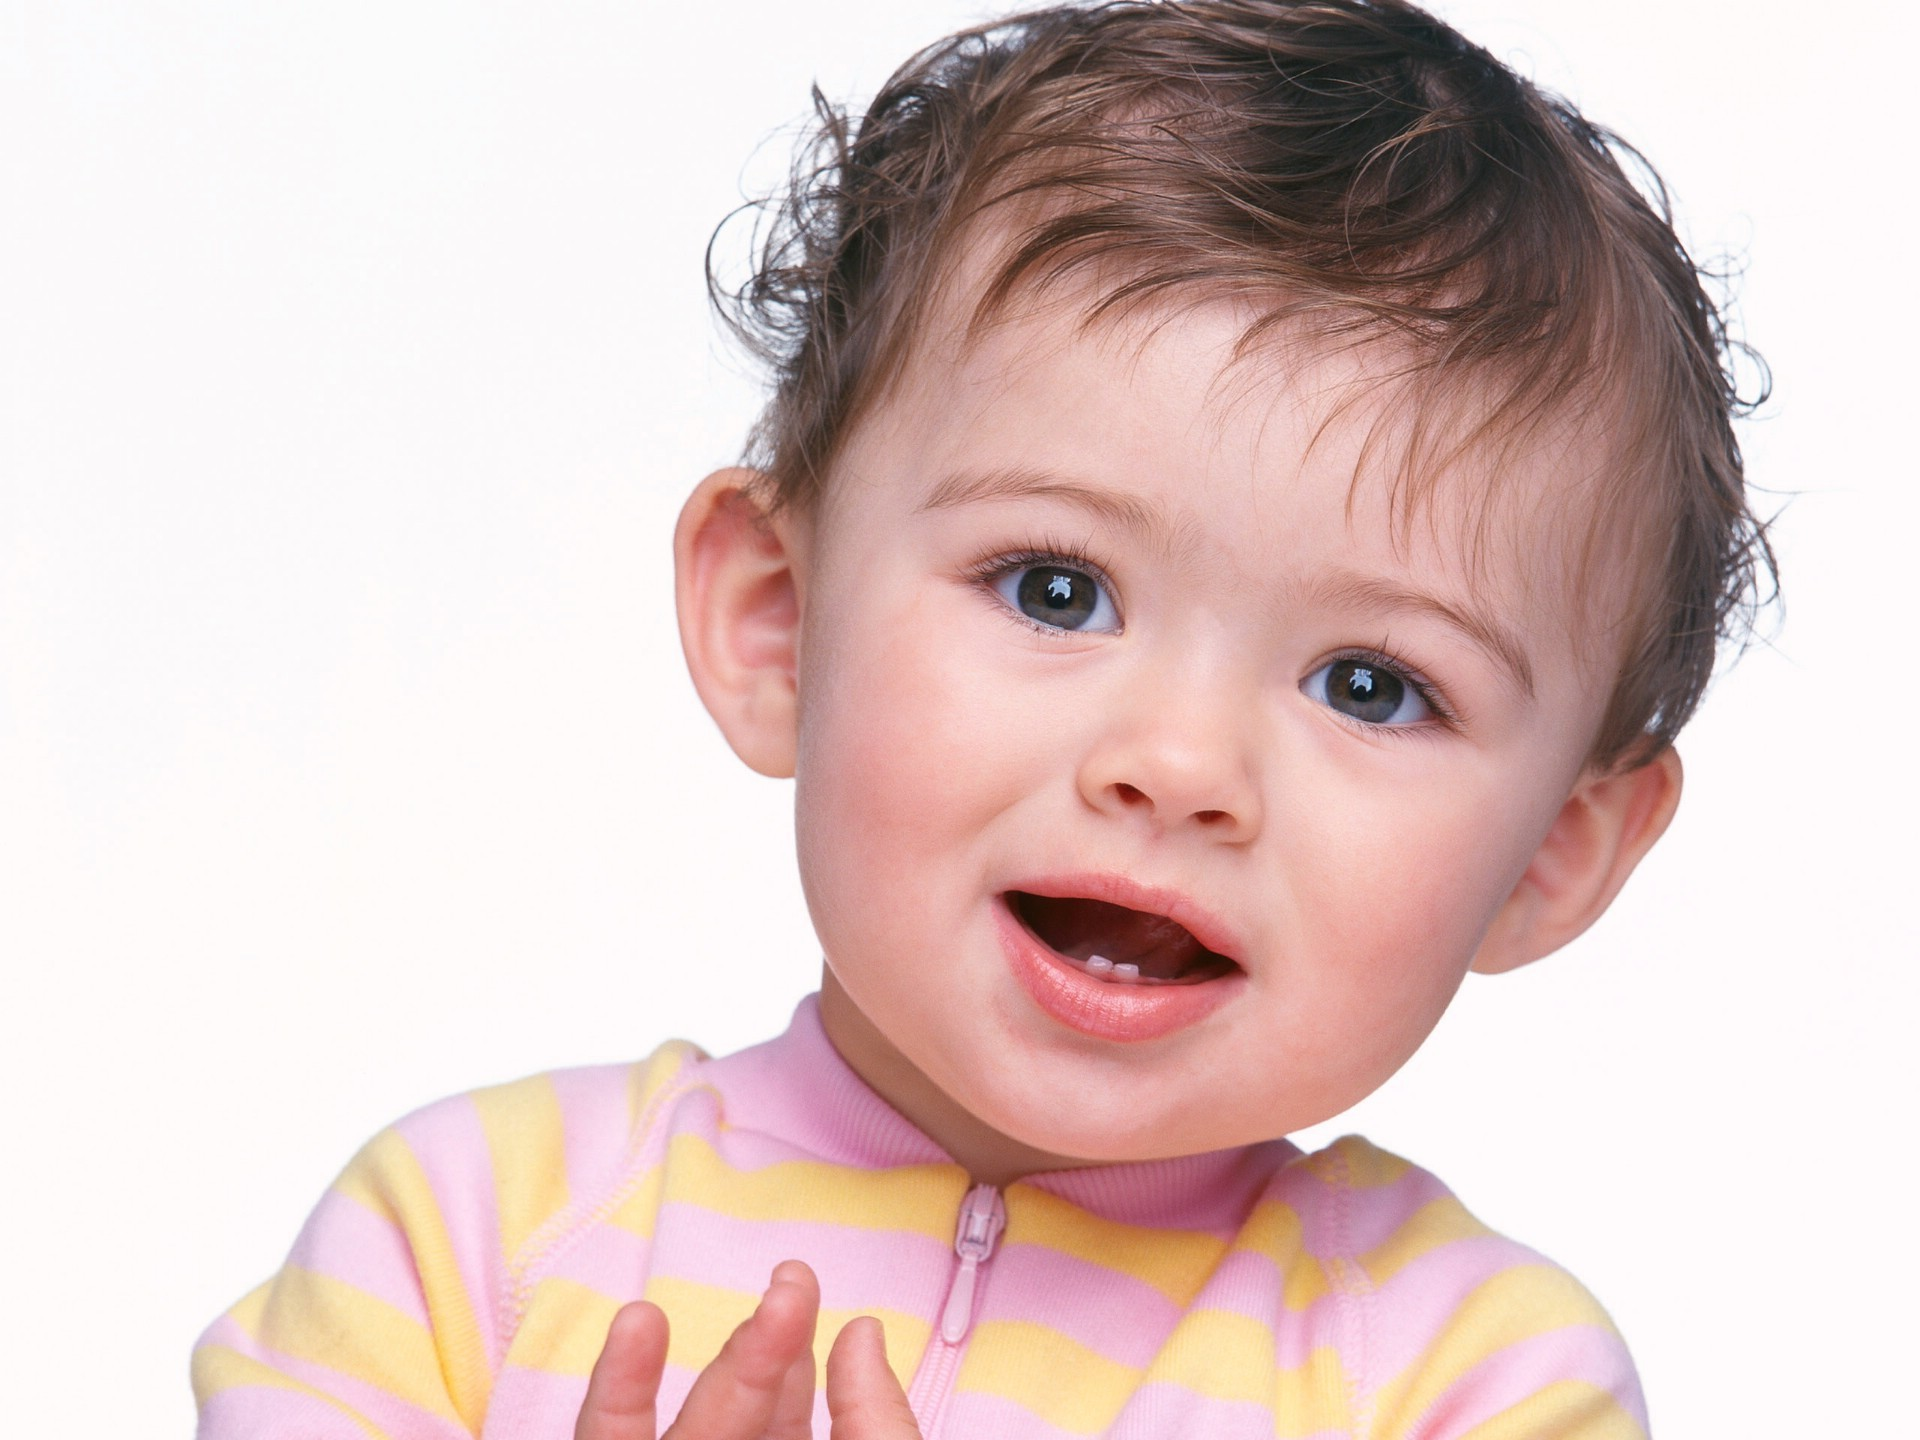 Cute Little Babies HQ (2) Wallpapers | HD Wallpapers